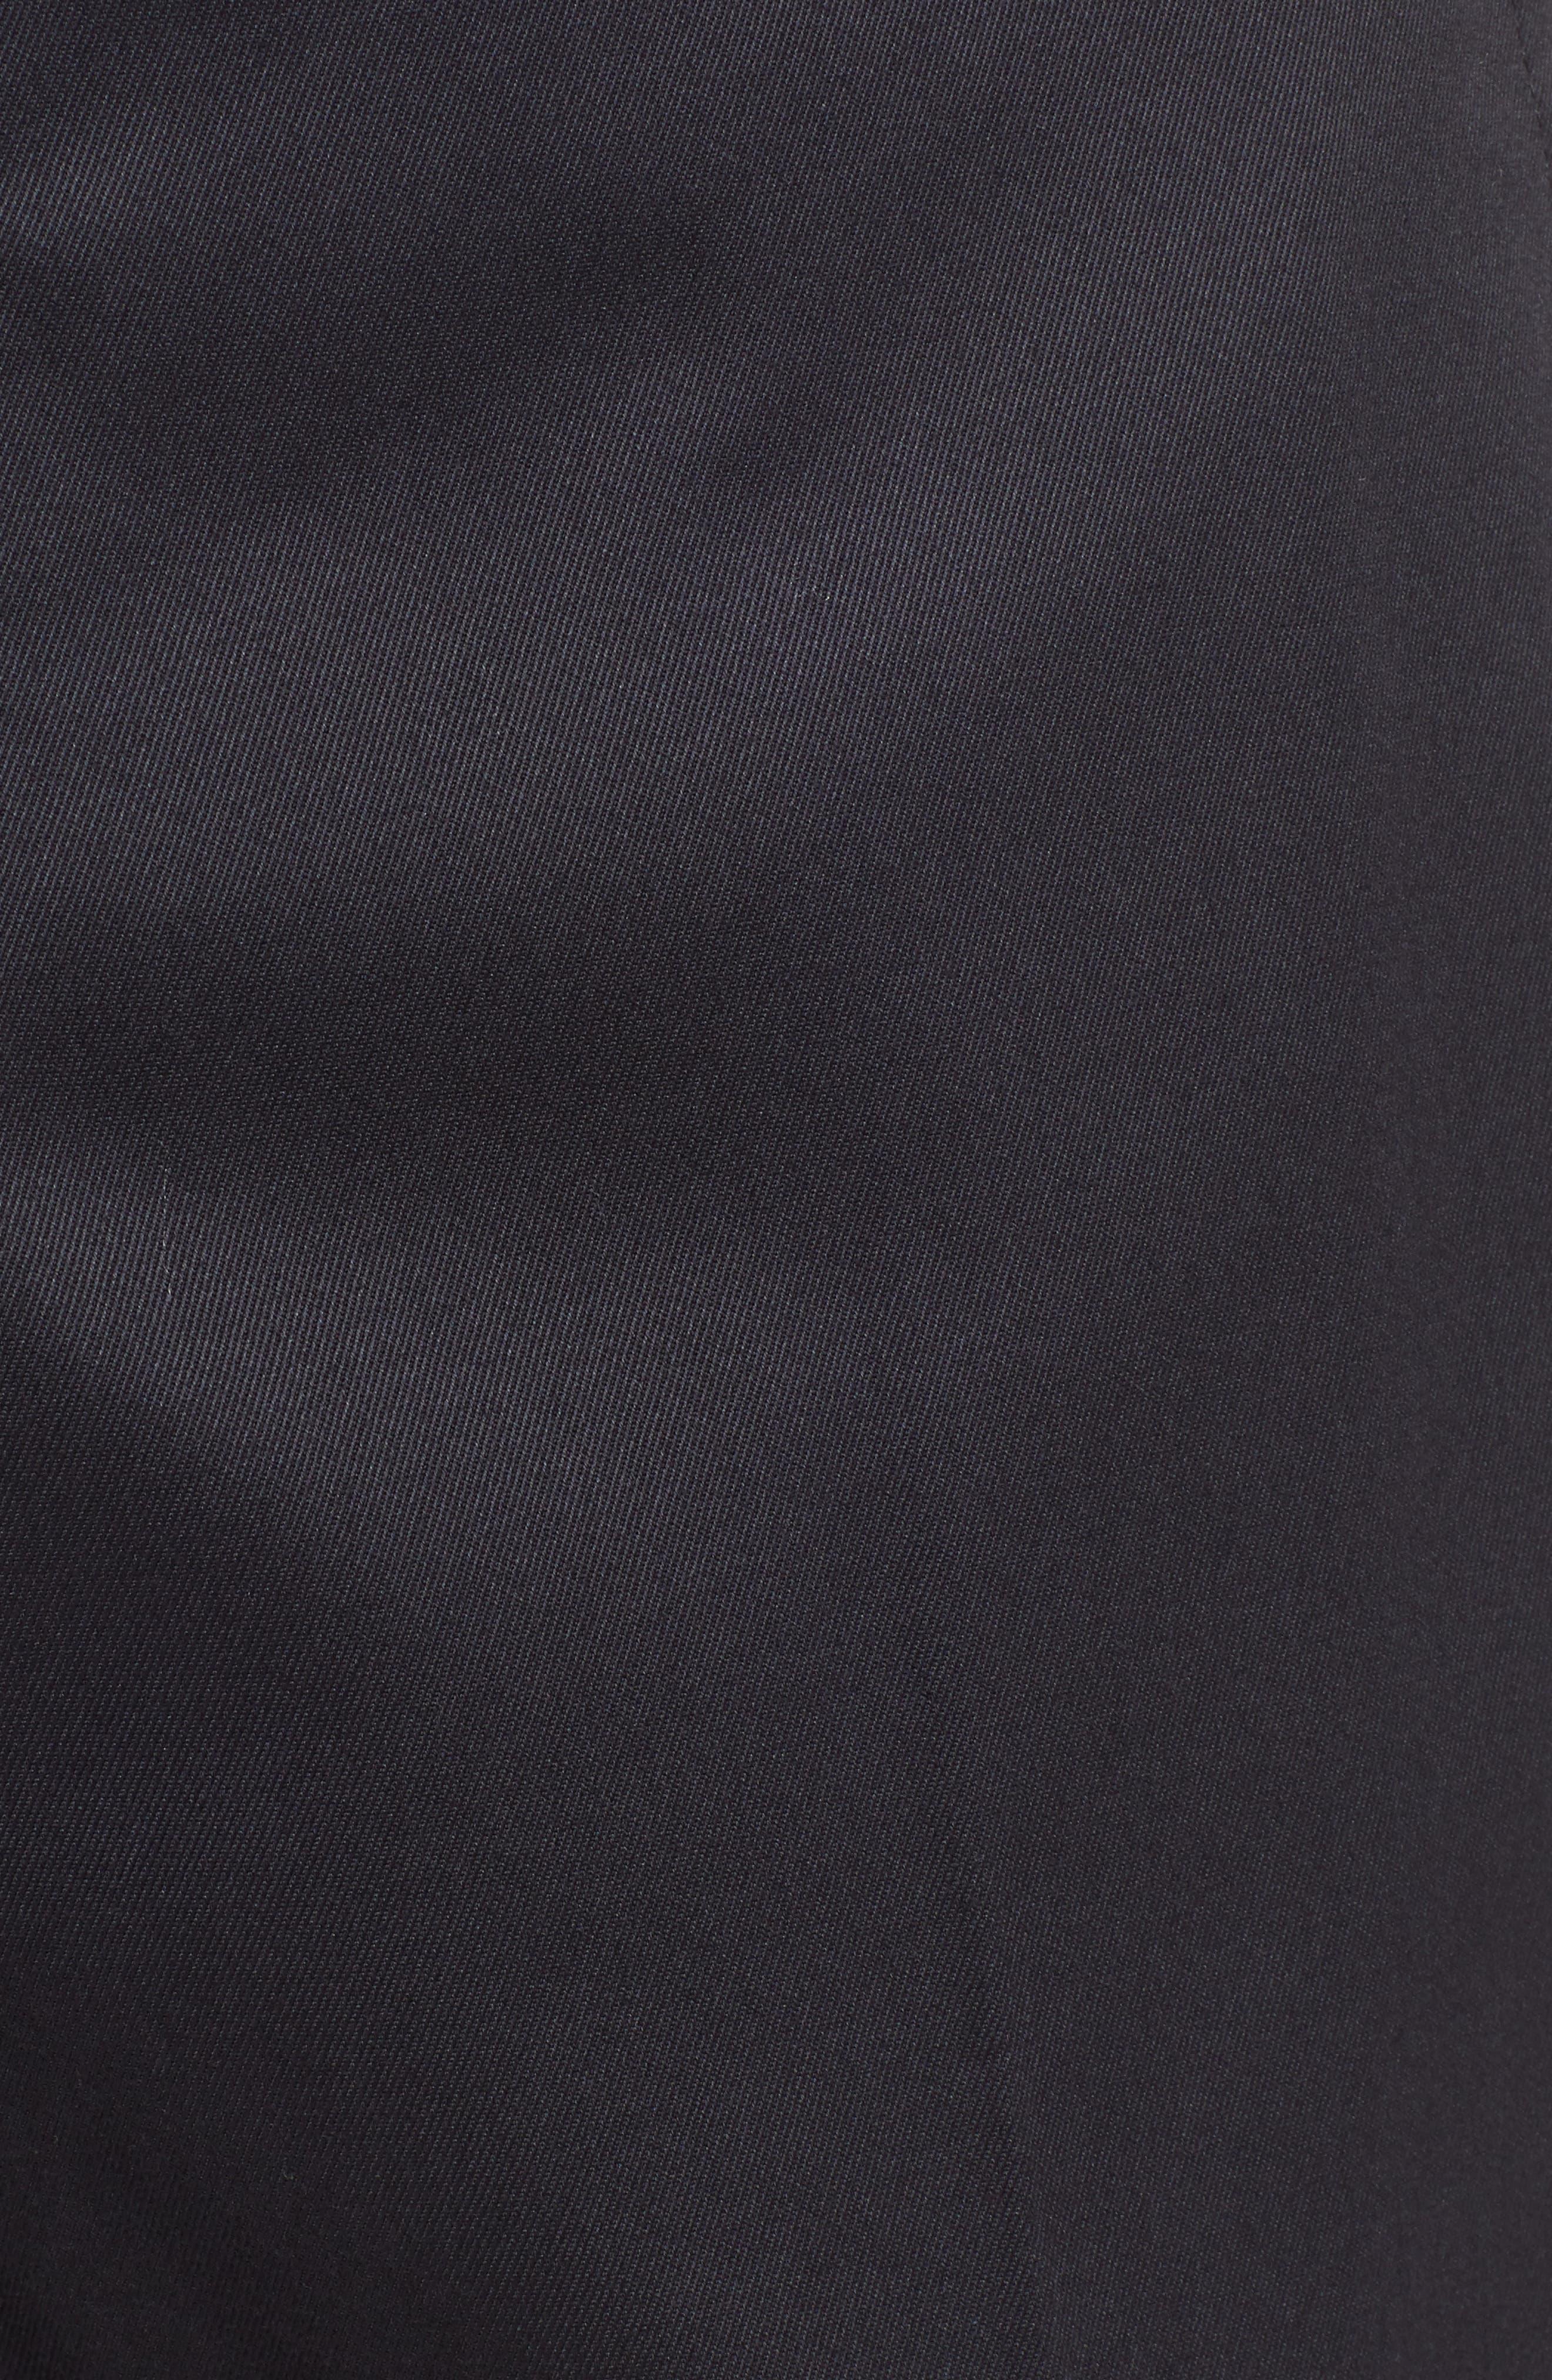 BONOBOS, Weekday Warrior Straight Leg Stretch Dress Pants, Alternate thumbnail 6, color, 001